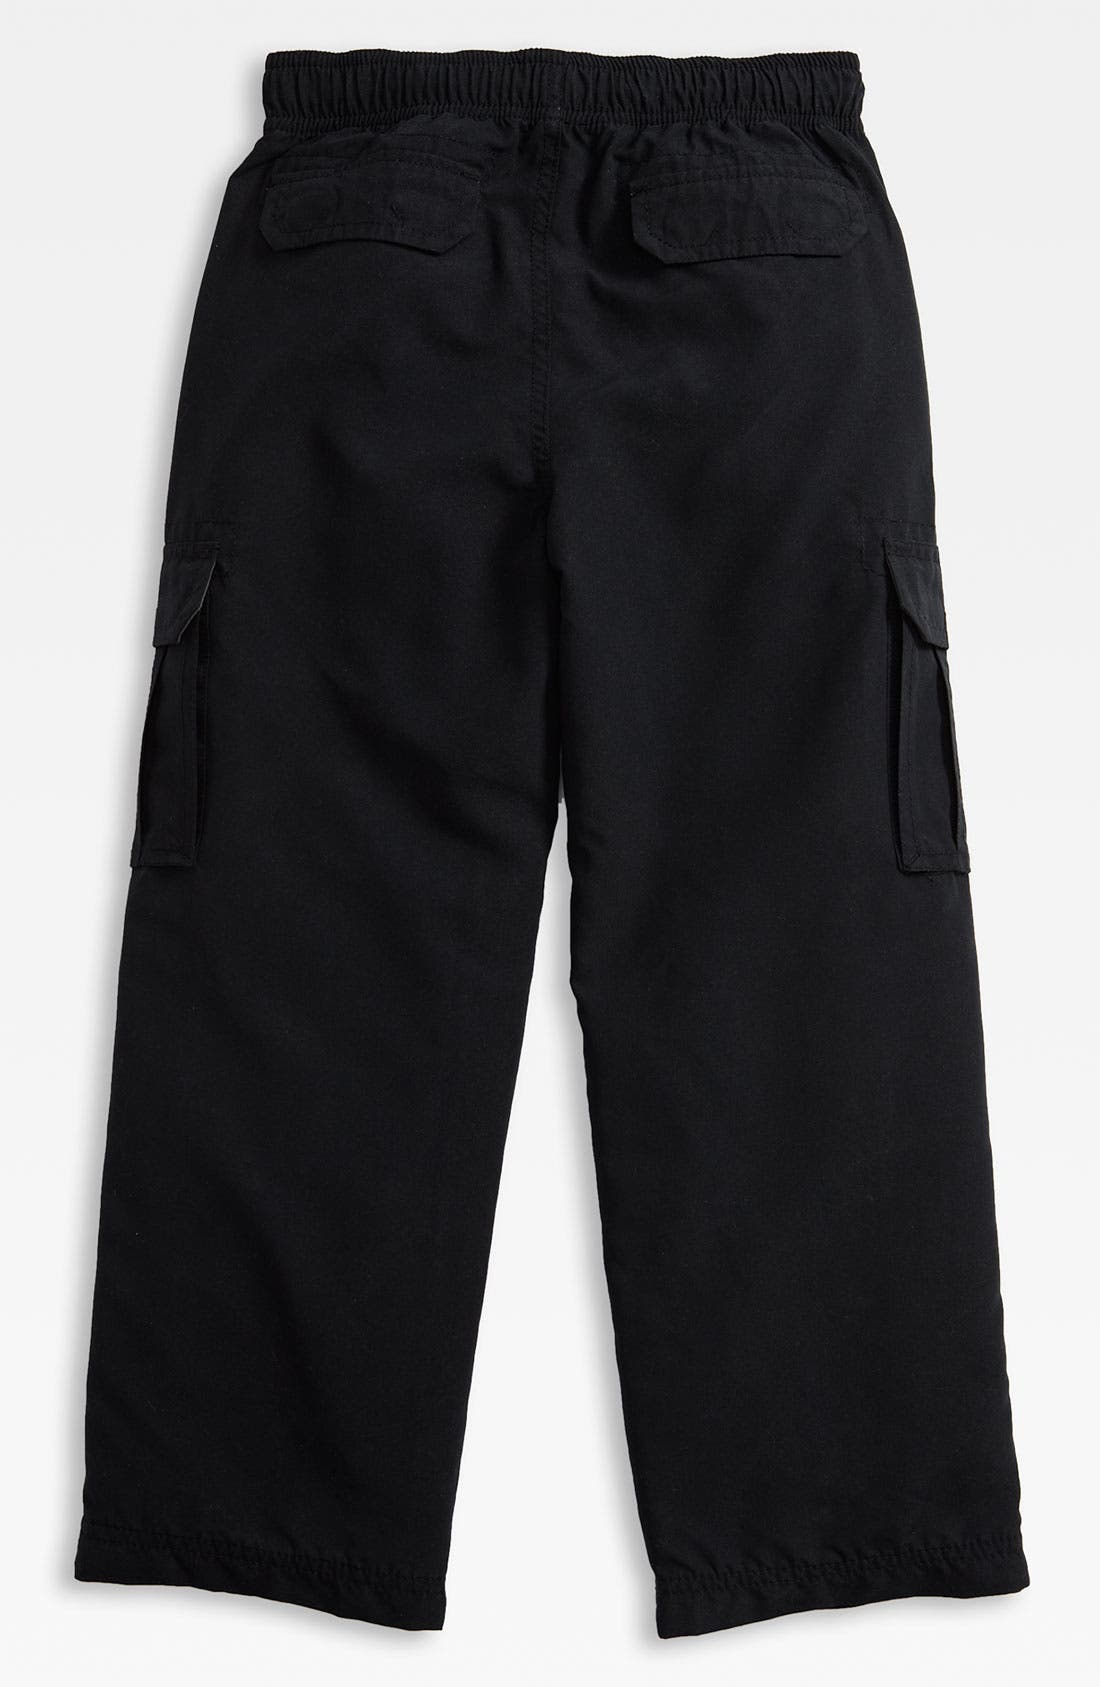 Main Image - Pure Stuff 'Summit' Pants (Big Boys)